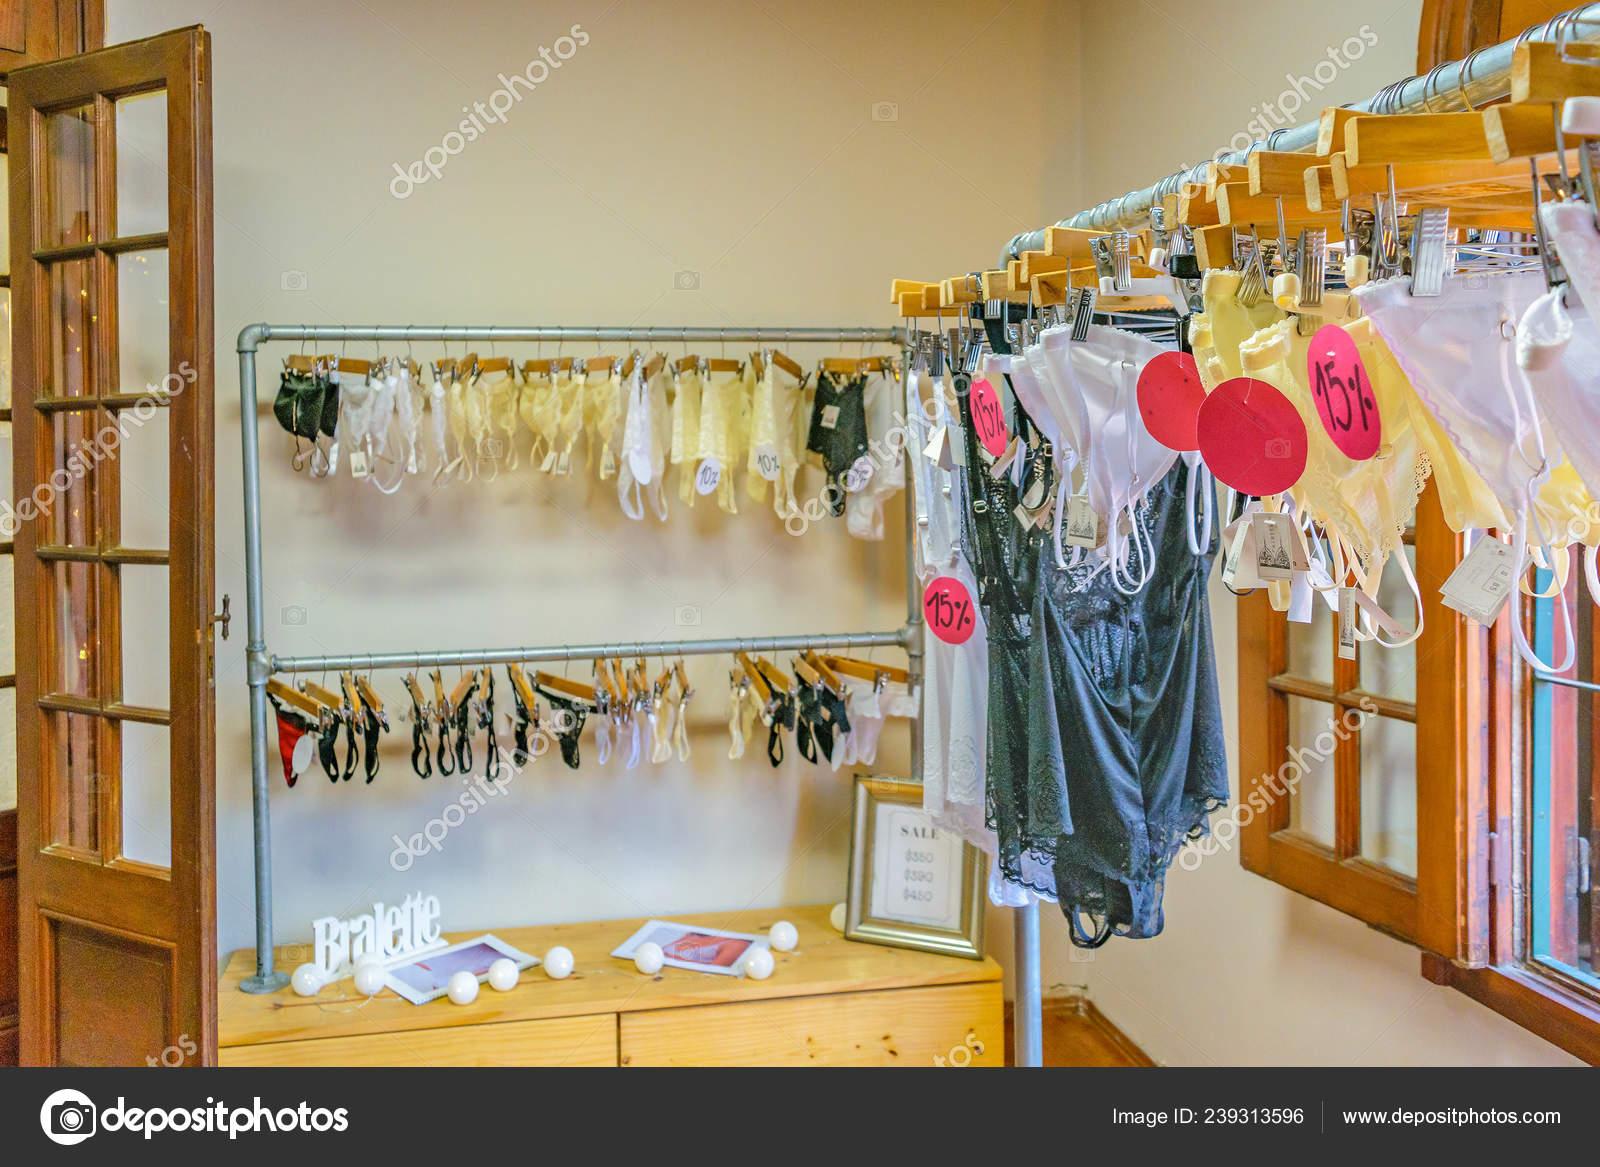 Empty Interior View Small Clothing Store Boutique Montevideo City Uruguay Stock Photo C Danflcreativo 239313596